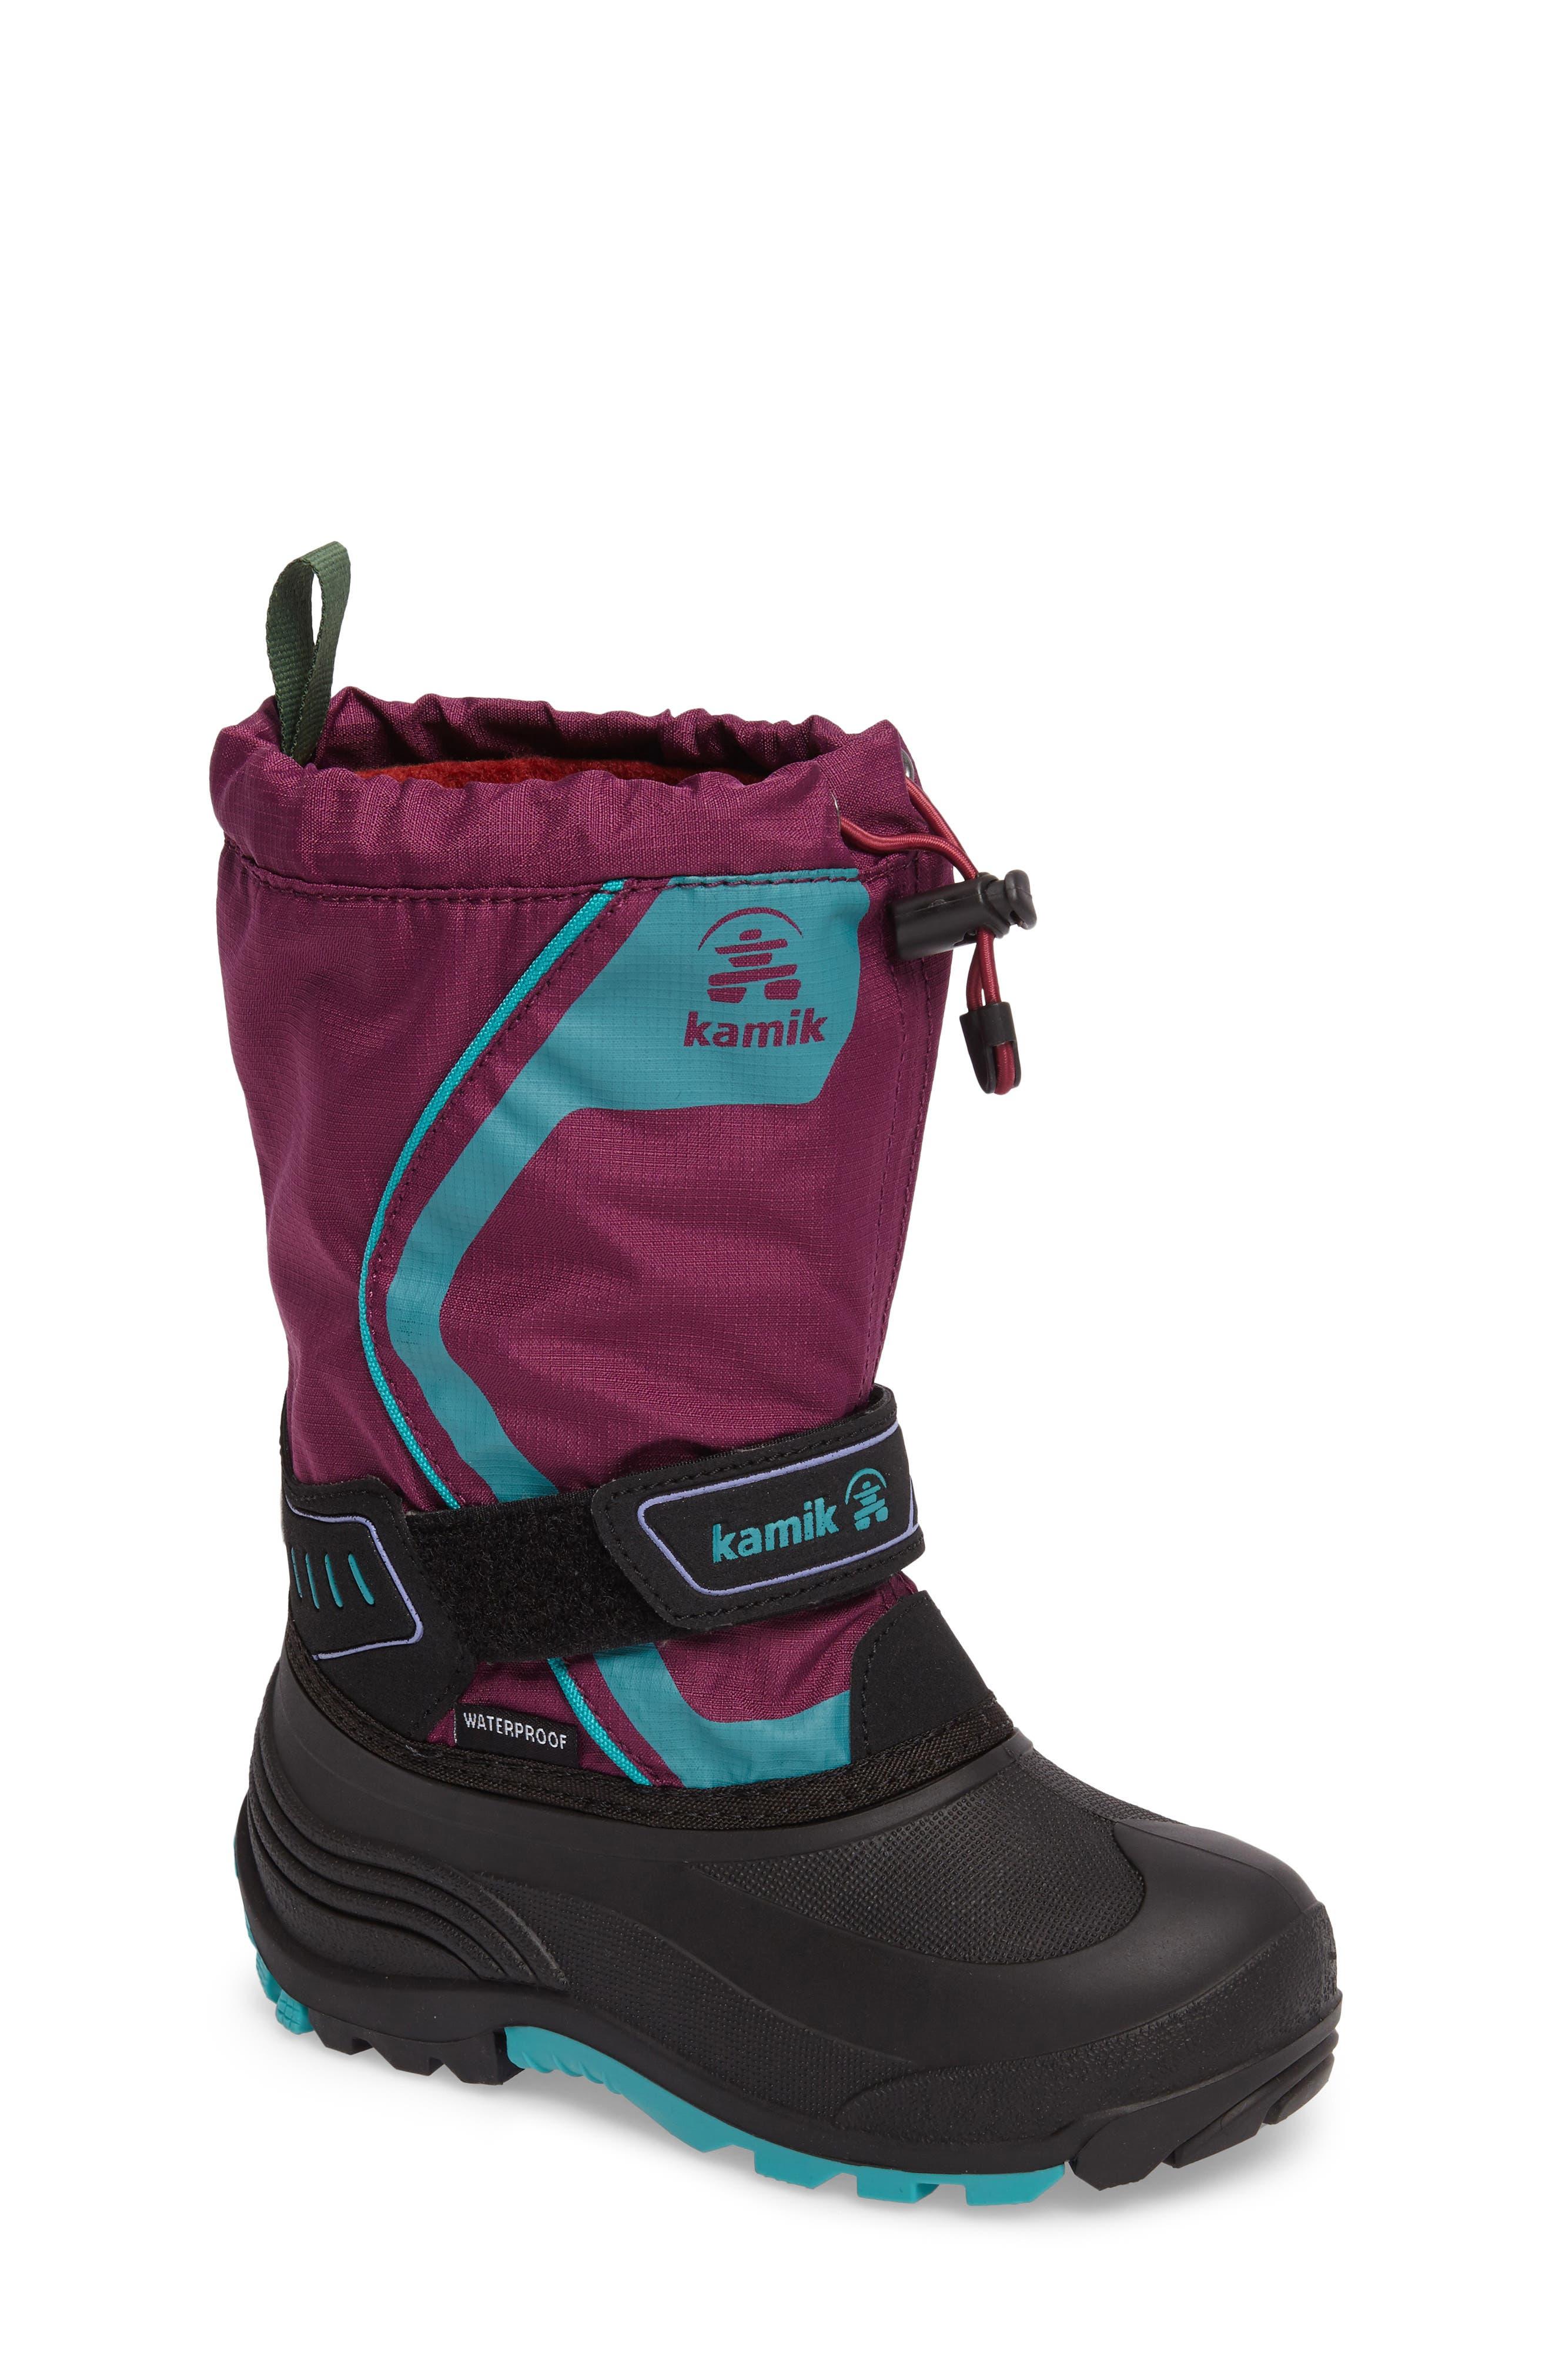 Kamik Snowcoast3 Waterproof Snow Boot (Toddler, Little Kid & Big Kid)